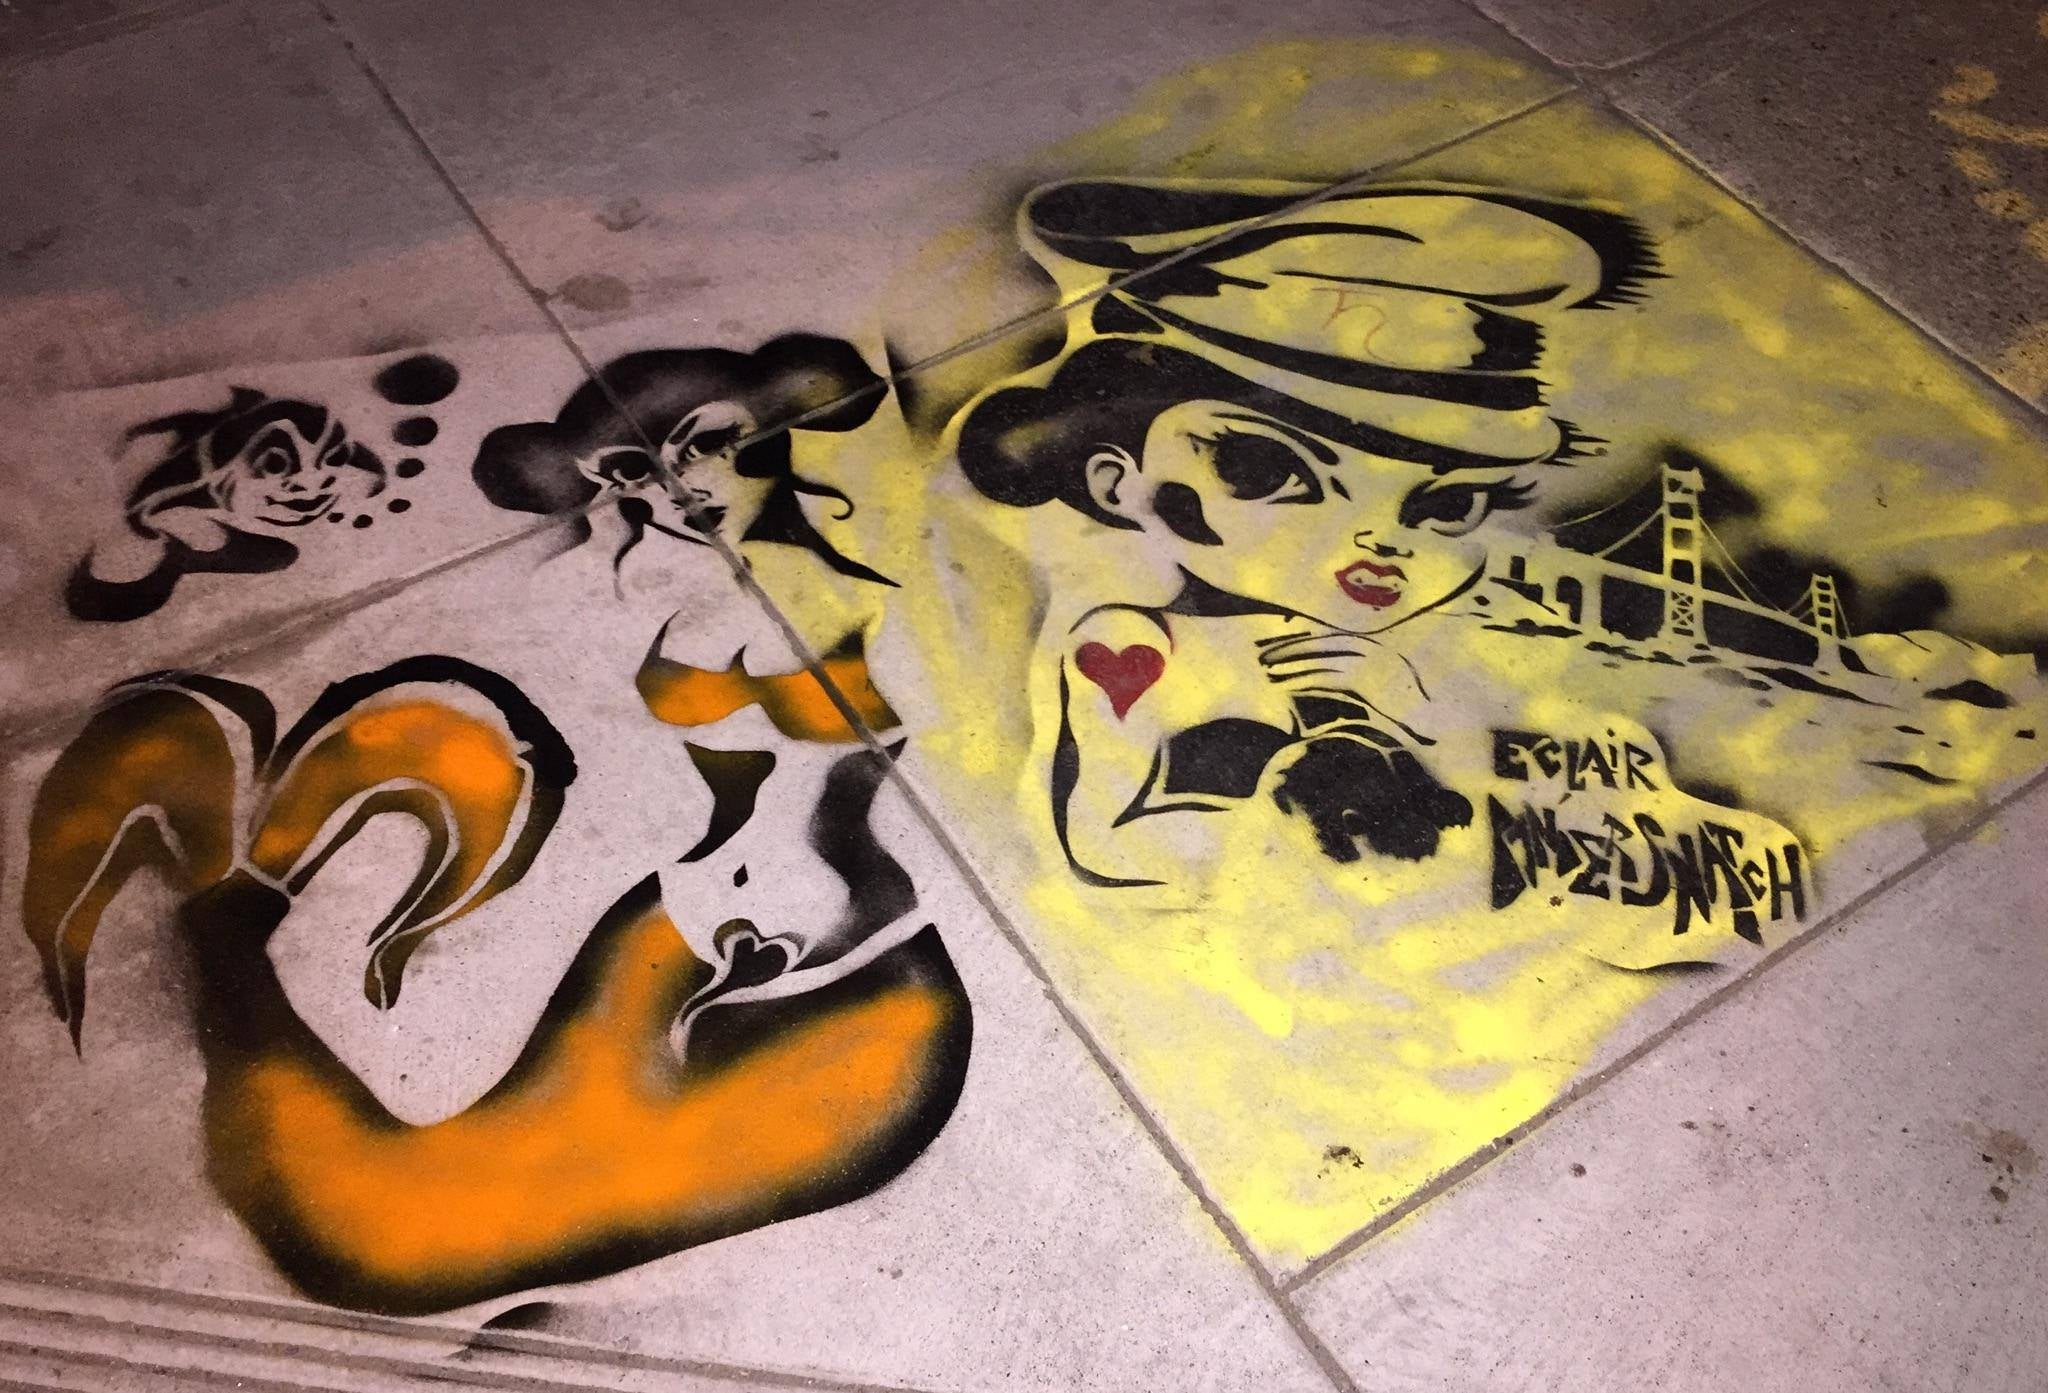 Eclair Bandersnatch: Street Artist for the Snowden Age